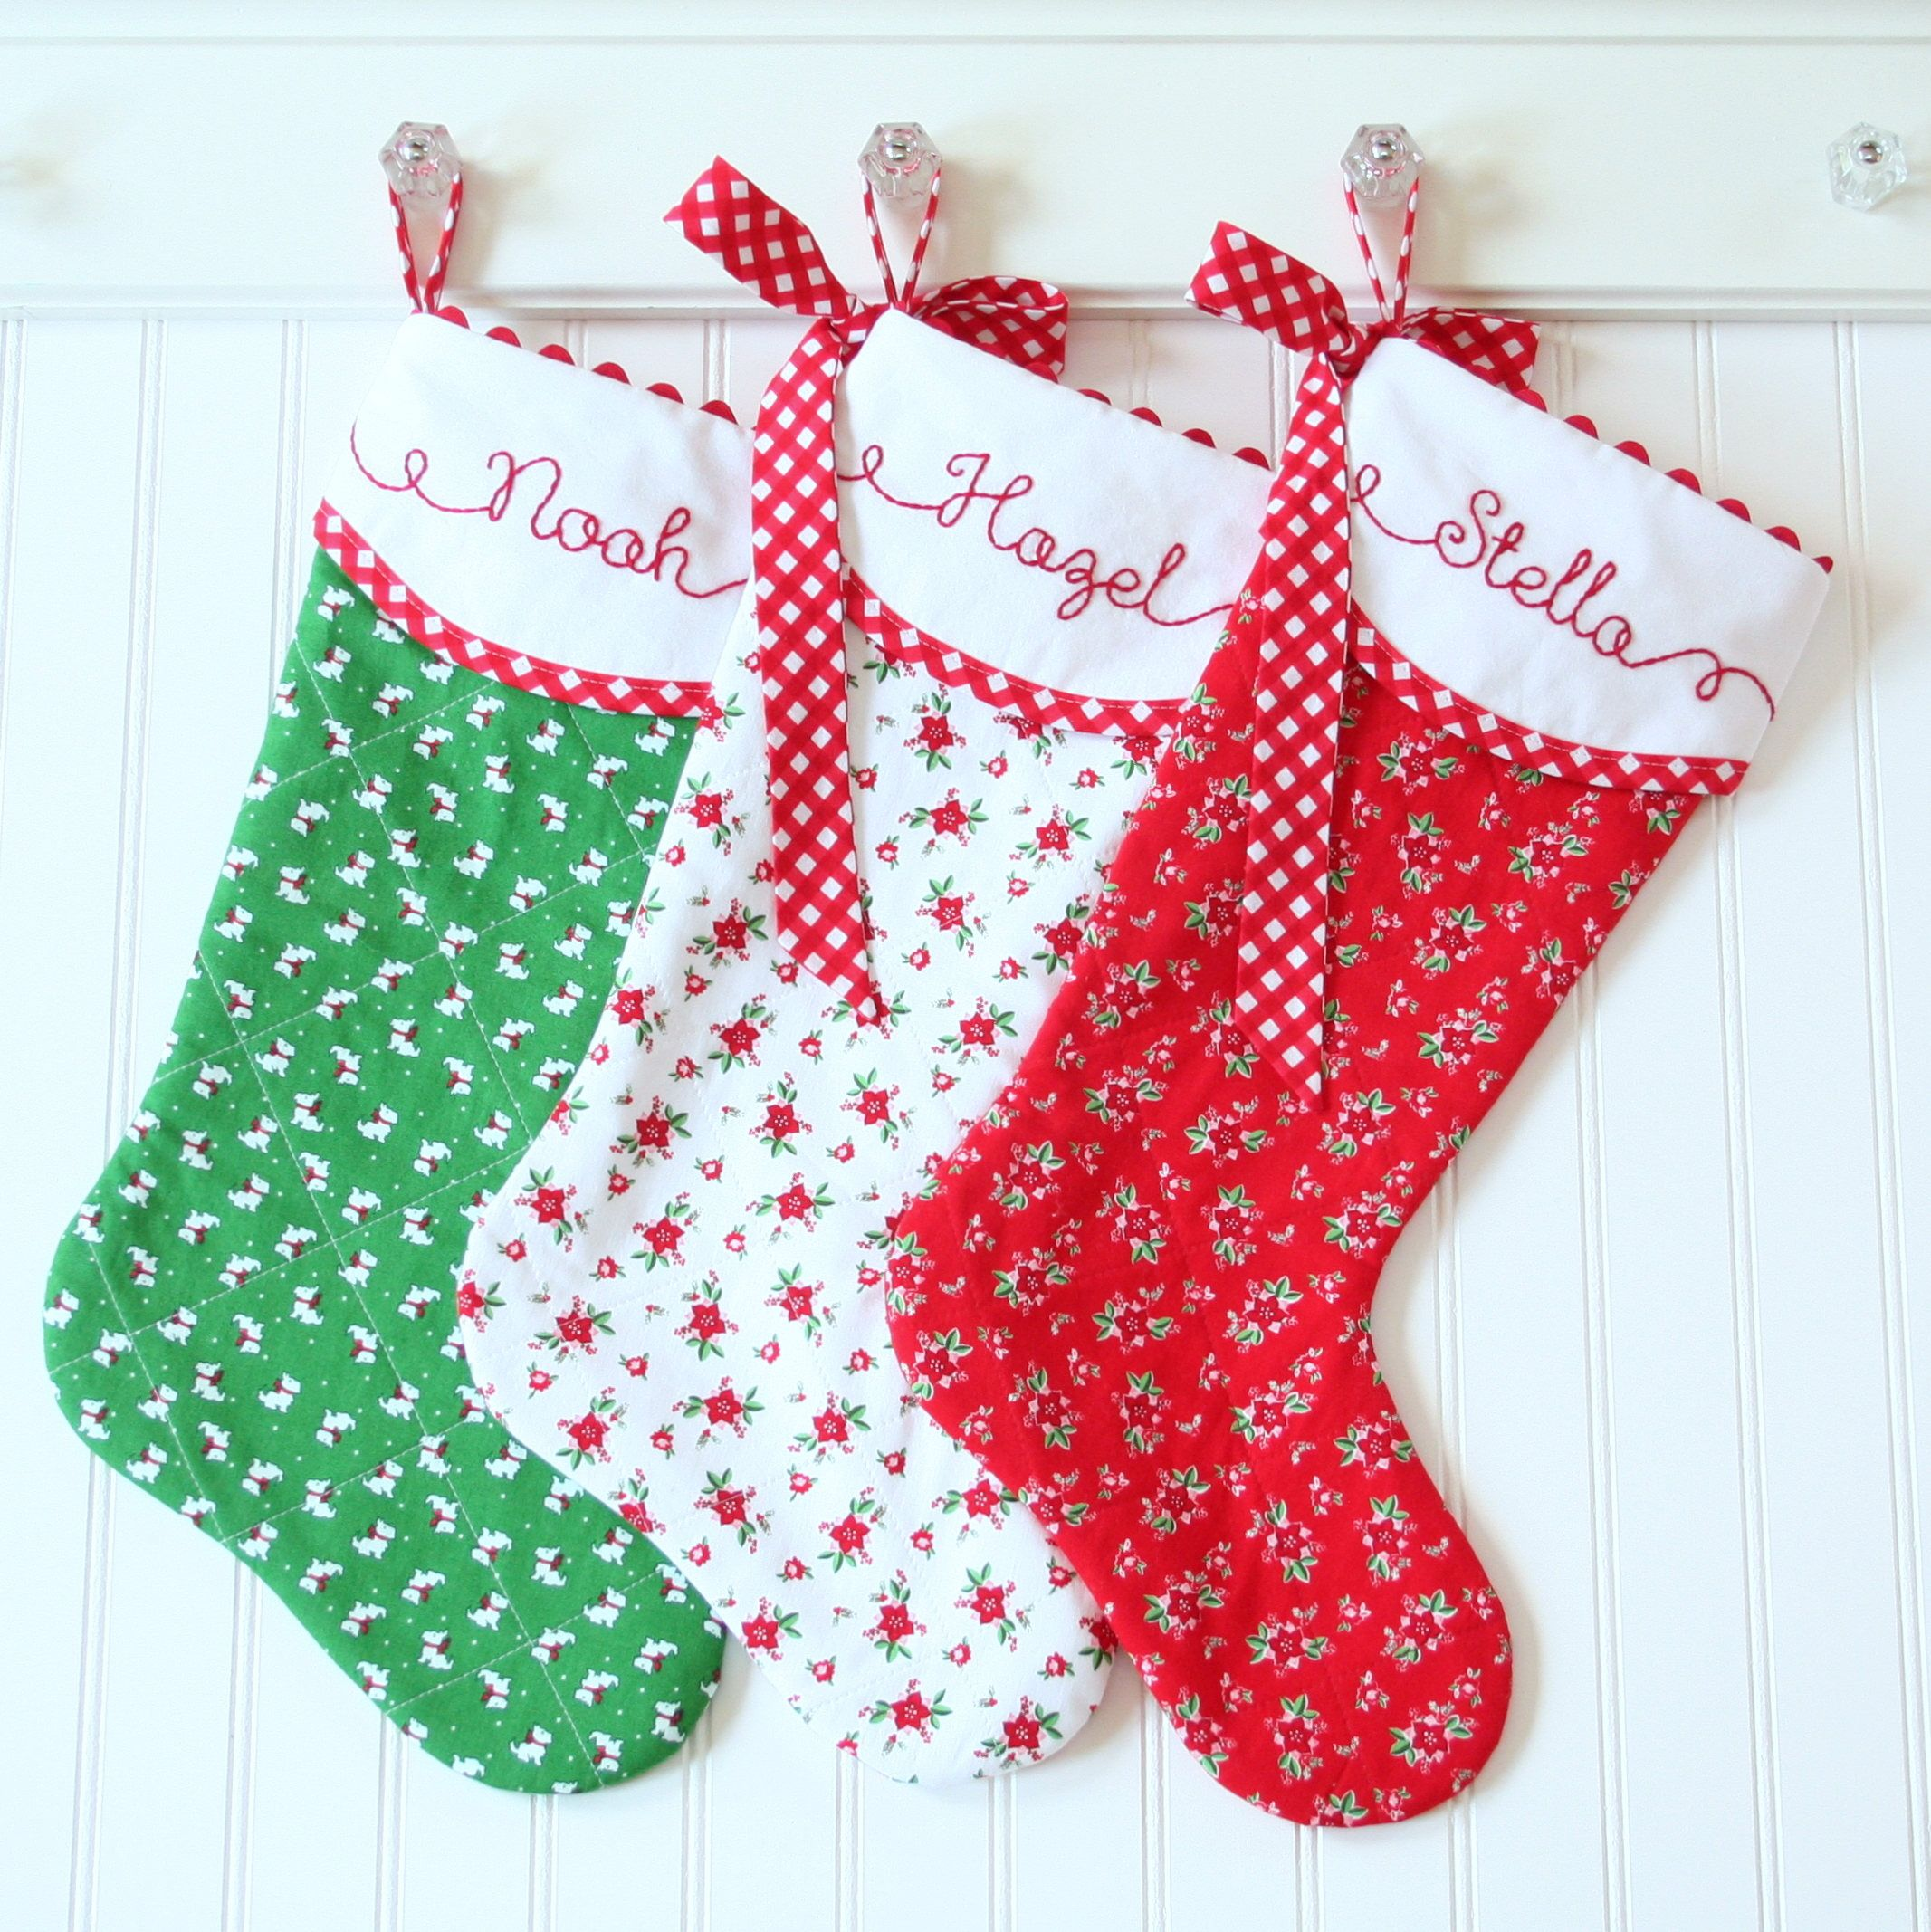 Christmas Stocking Personalized Christmas Stocking Hand